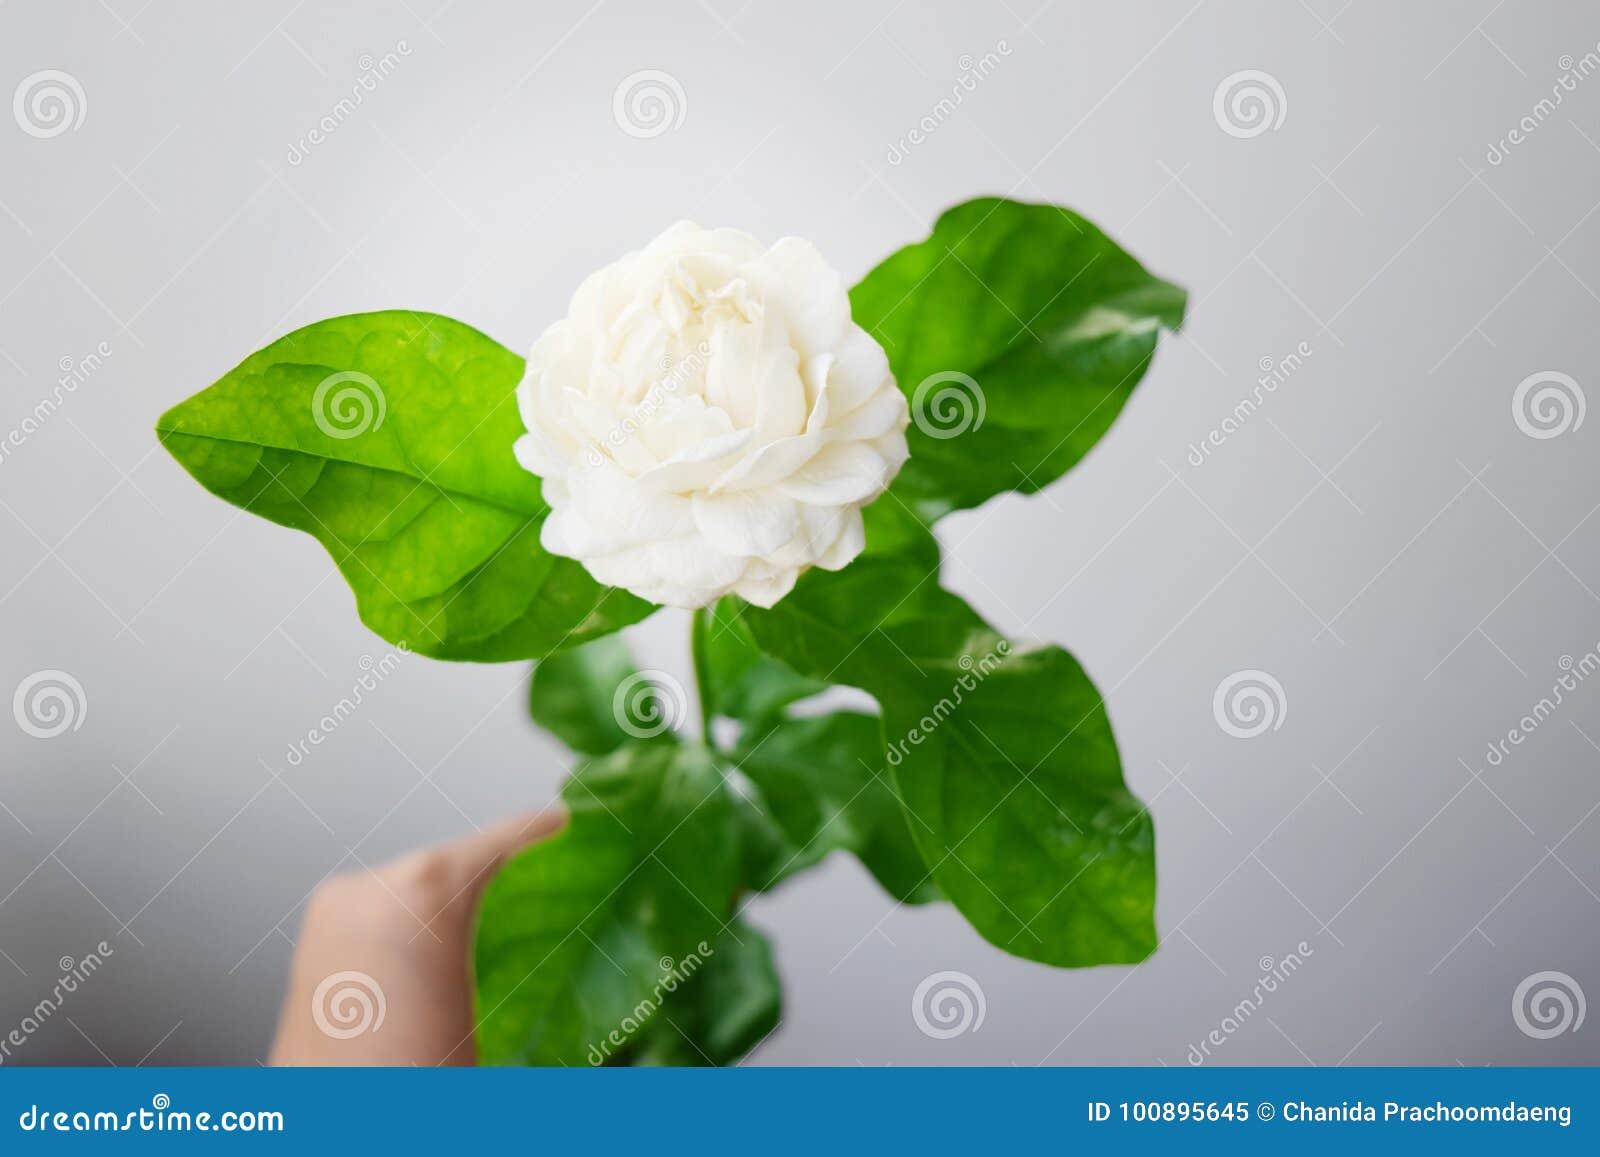 White flower have soft petals jasminum sambac in scientific name download white flower have soft petals jasminum sambac in scientific name and space for text izmirmasajfo